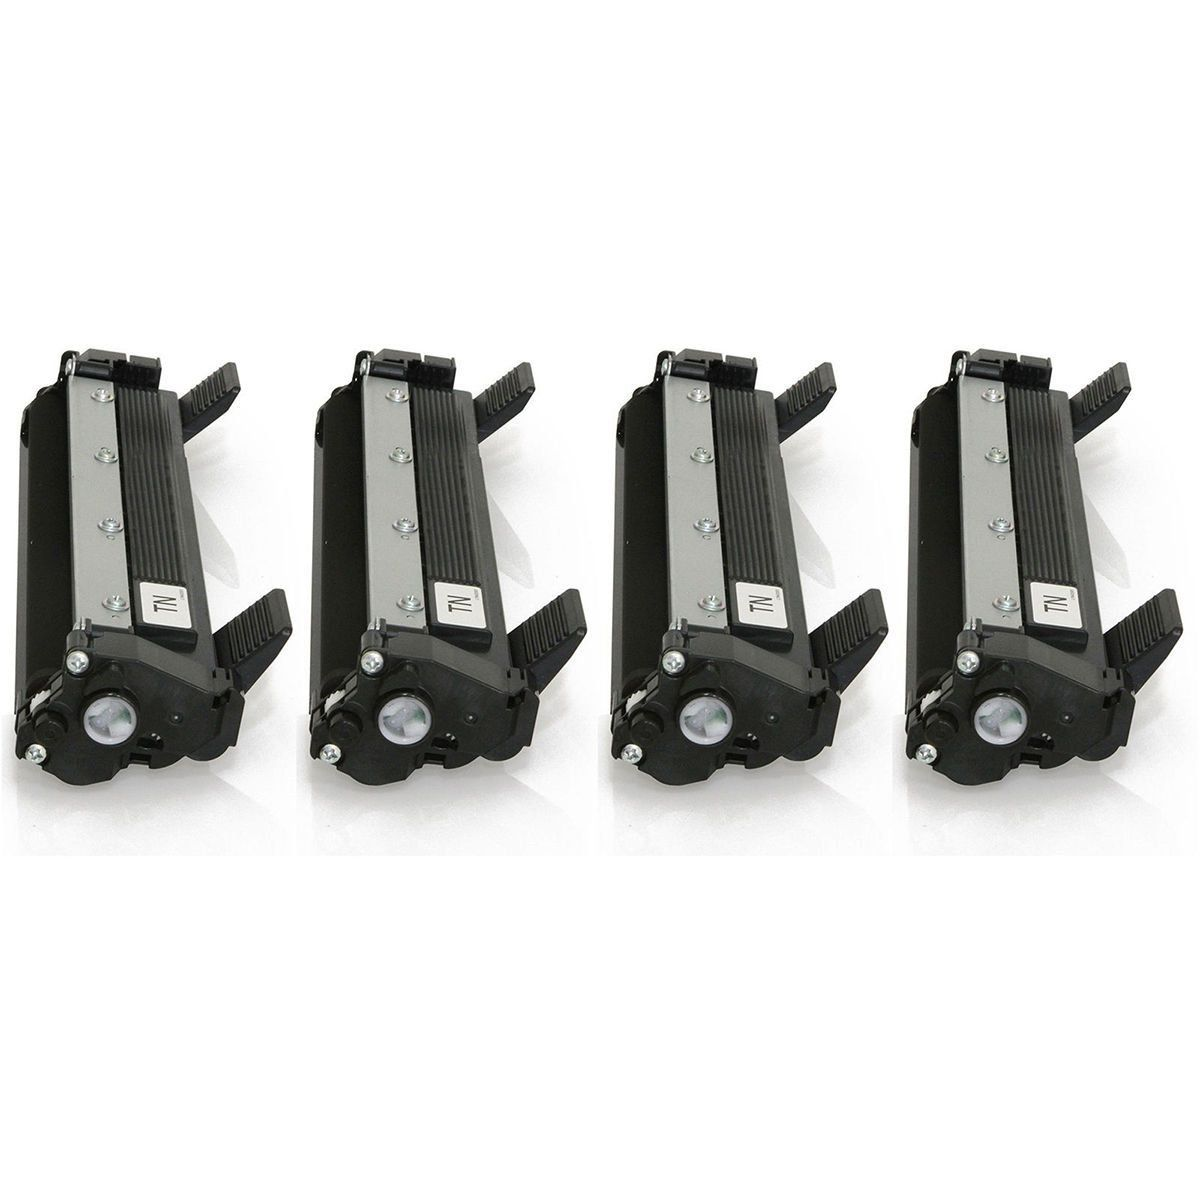 Compatível: Kit 4x Toner TN-1000 TN-1060 para Brother DCP-1612w DCP-1510 DCP-1602 DCP-1518 HL-1210w / Preto / 1.000